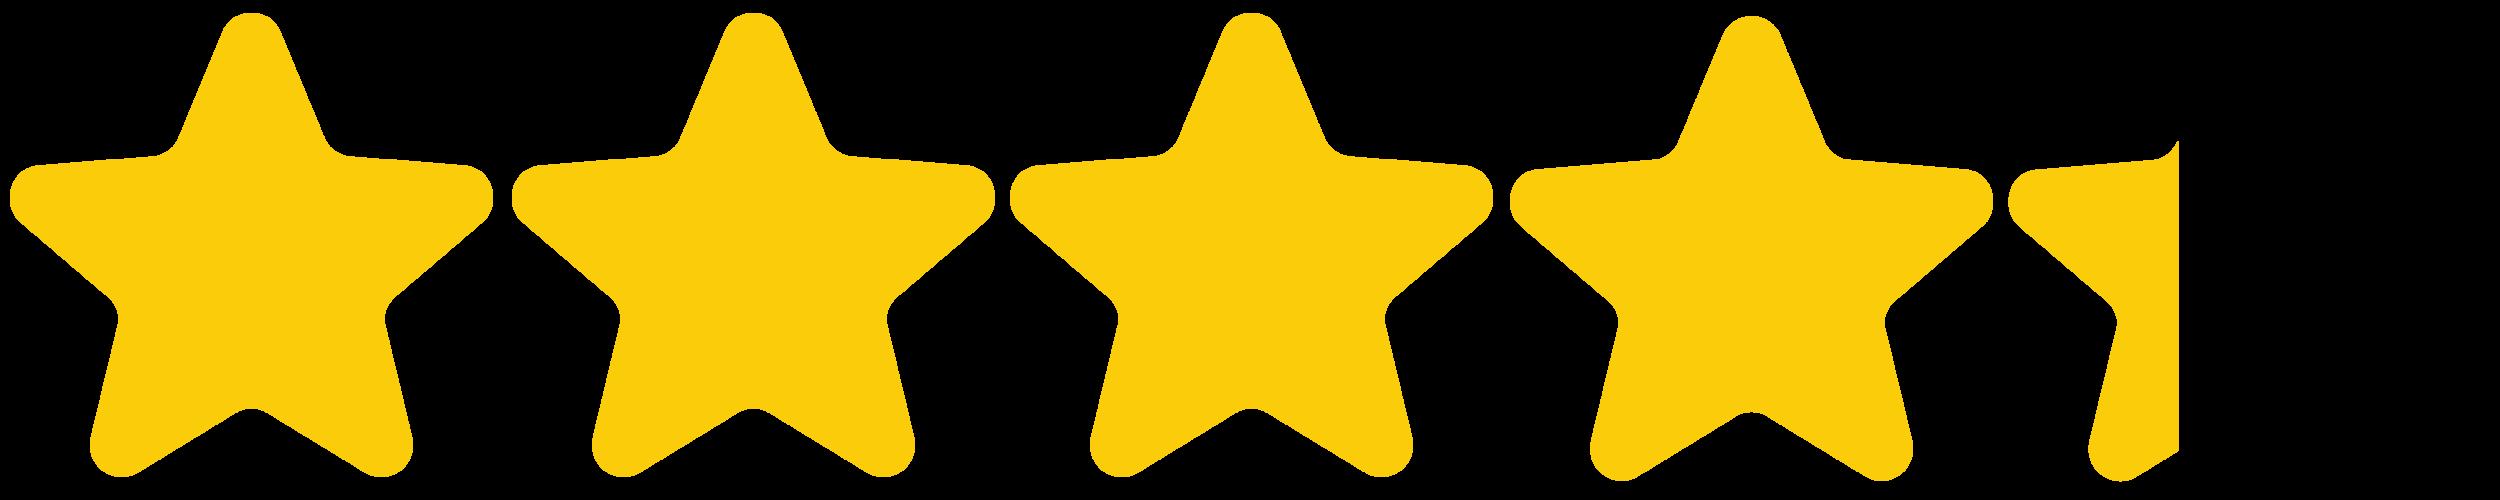 - (4.25 stars)